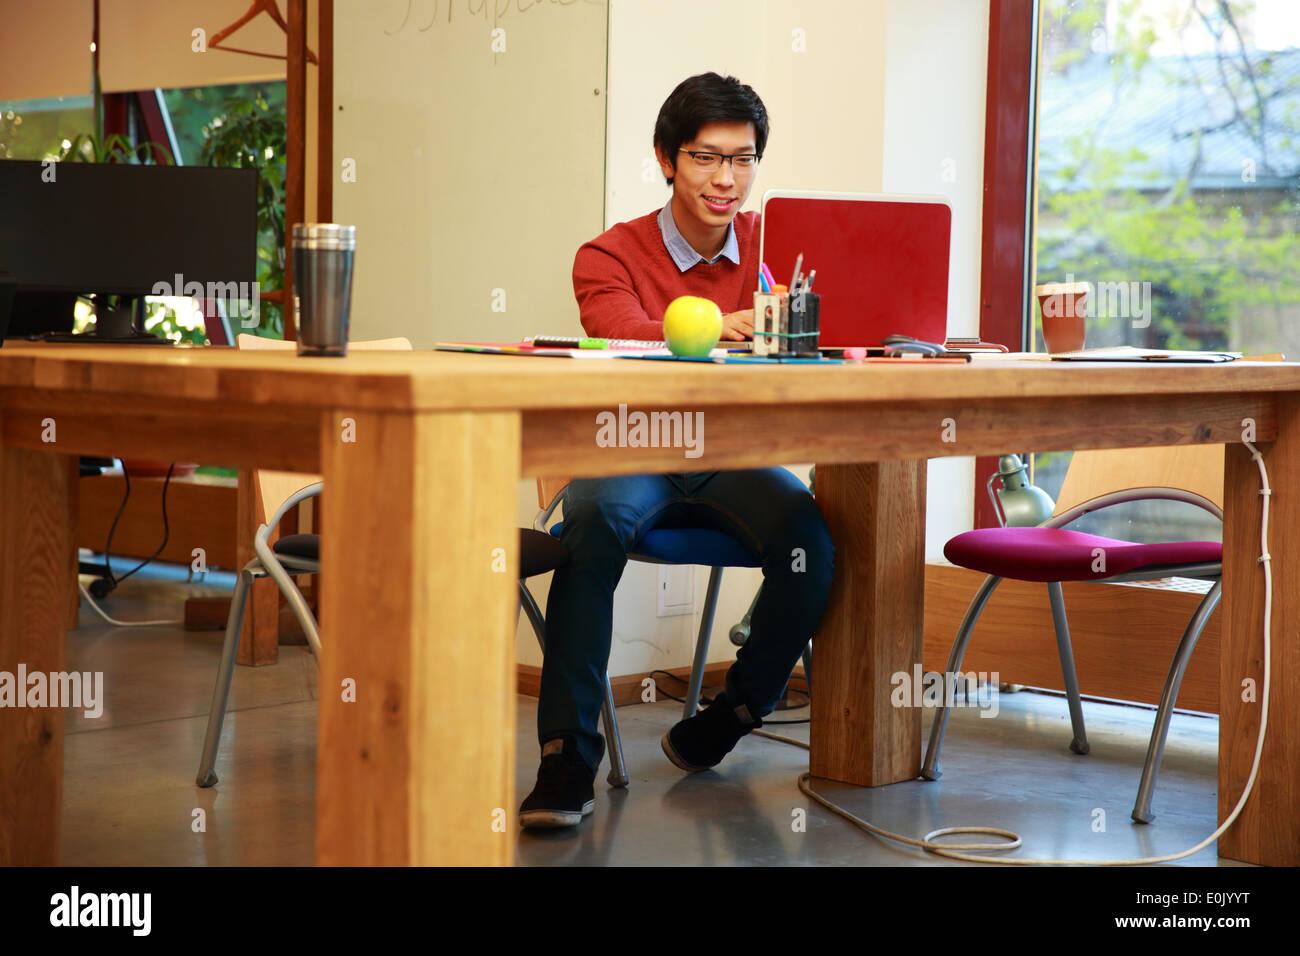 Joven hombre asiático utilización portátil Imagen De Stock